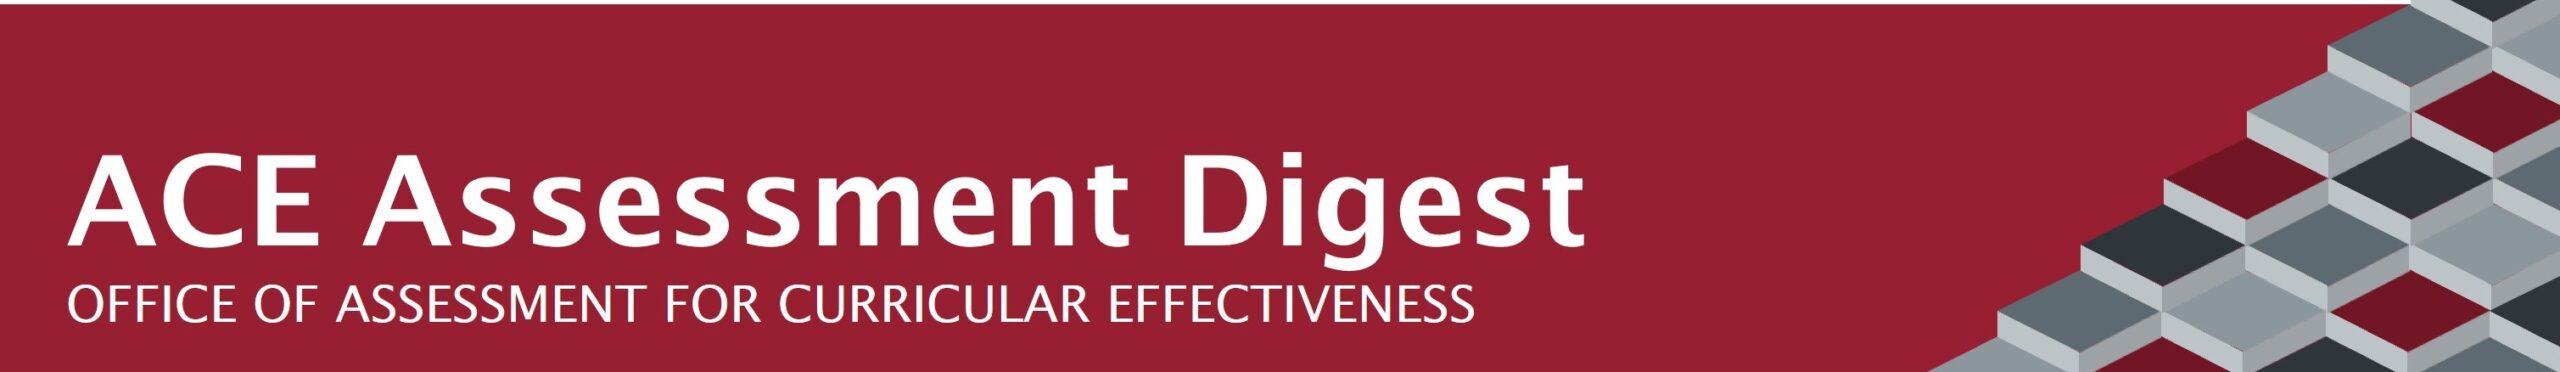 ACE Assessment Digest Header.